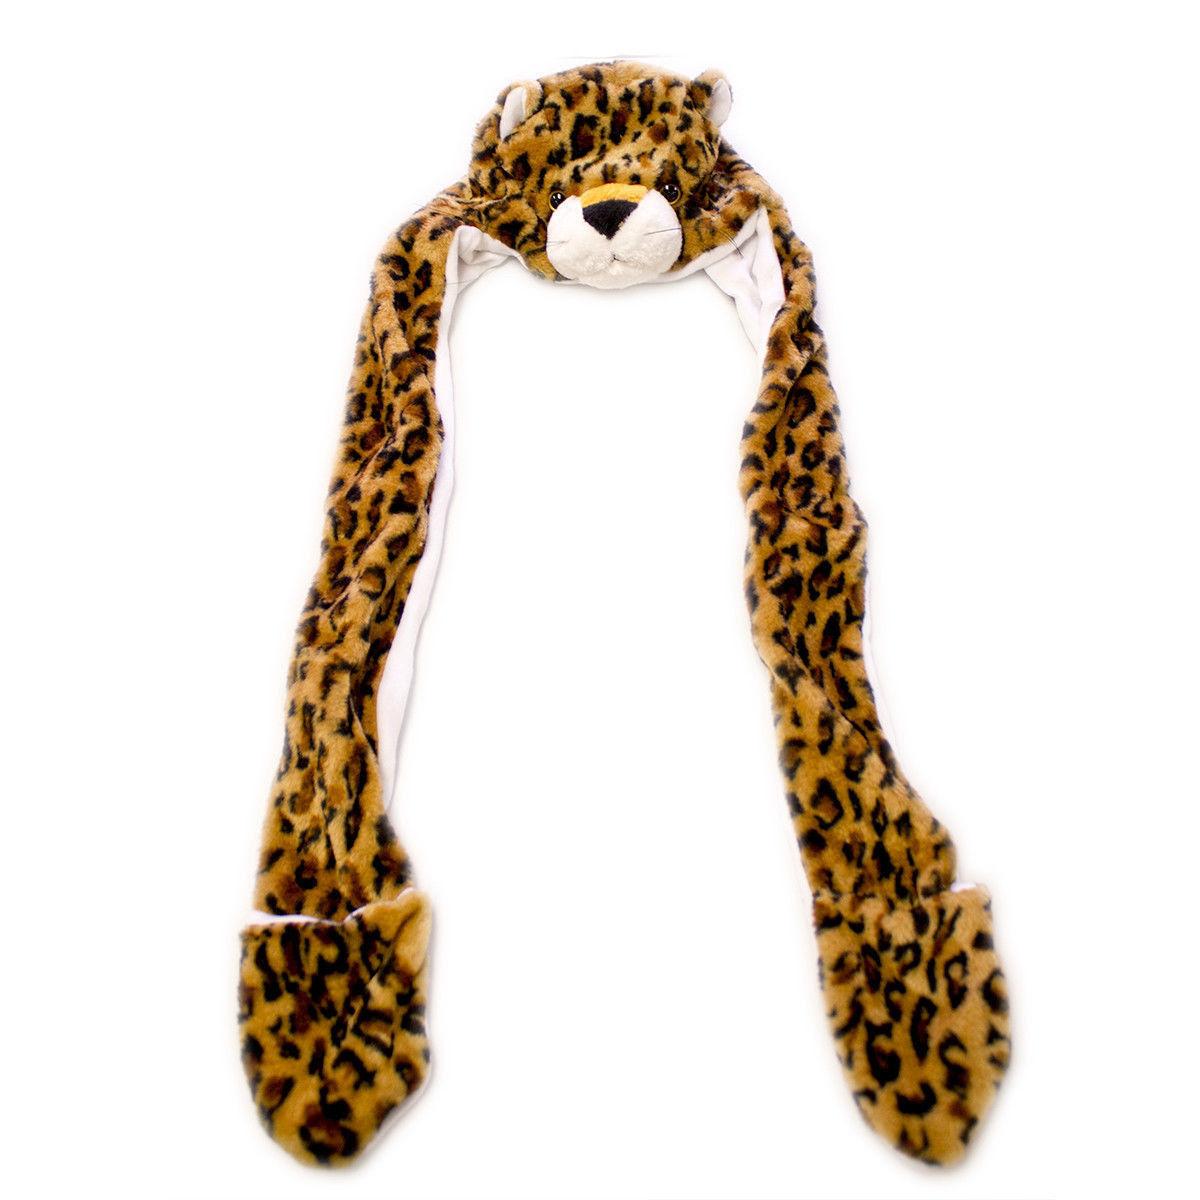 Leopard Winter Hat Fluffy Plush Warm Cap Mittens Scarf Gift Hoodie Beanie 2pk